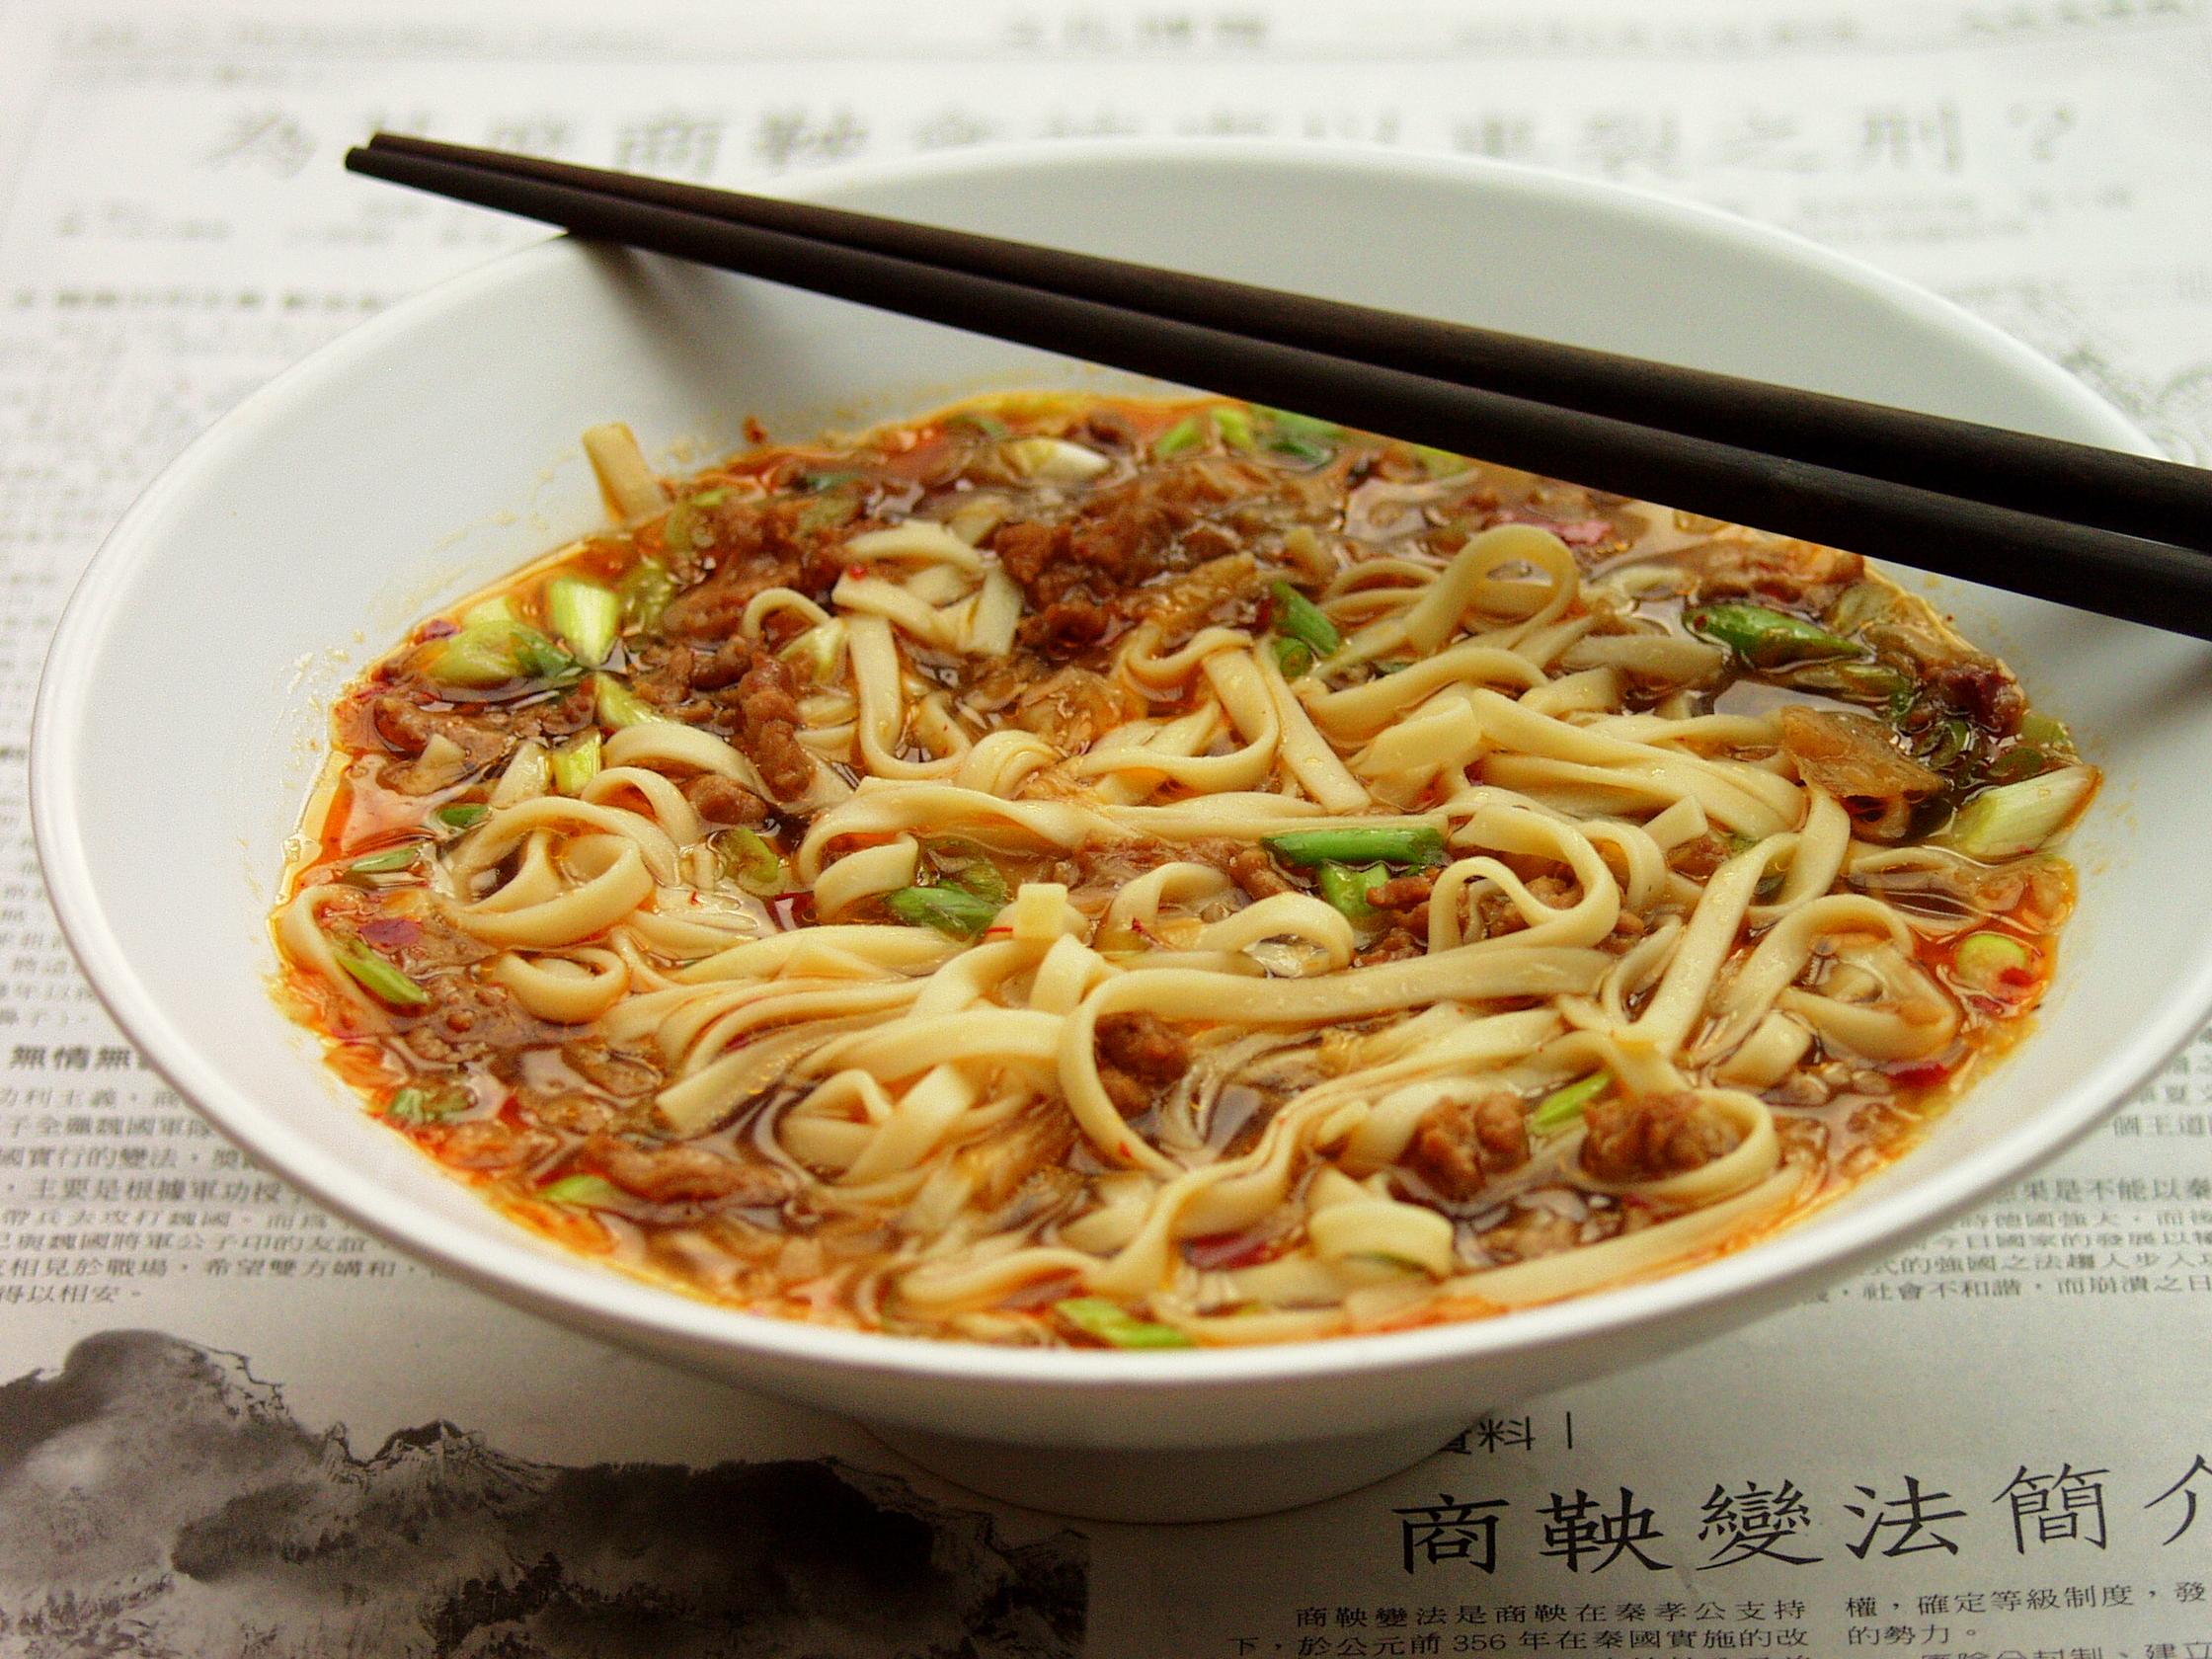 was dan dan mien dan dan noodles dan dan noodles beth nakamura dan dan ...